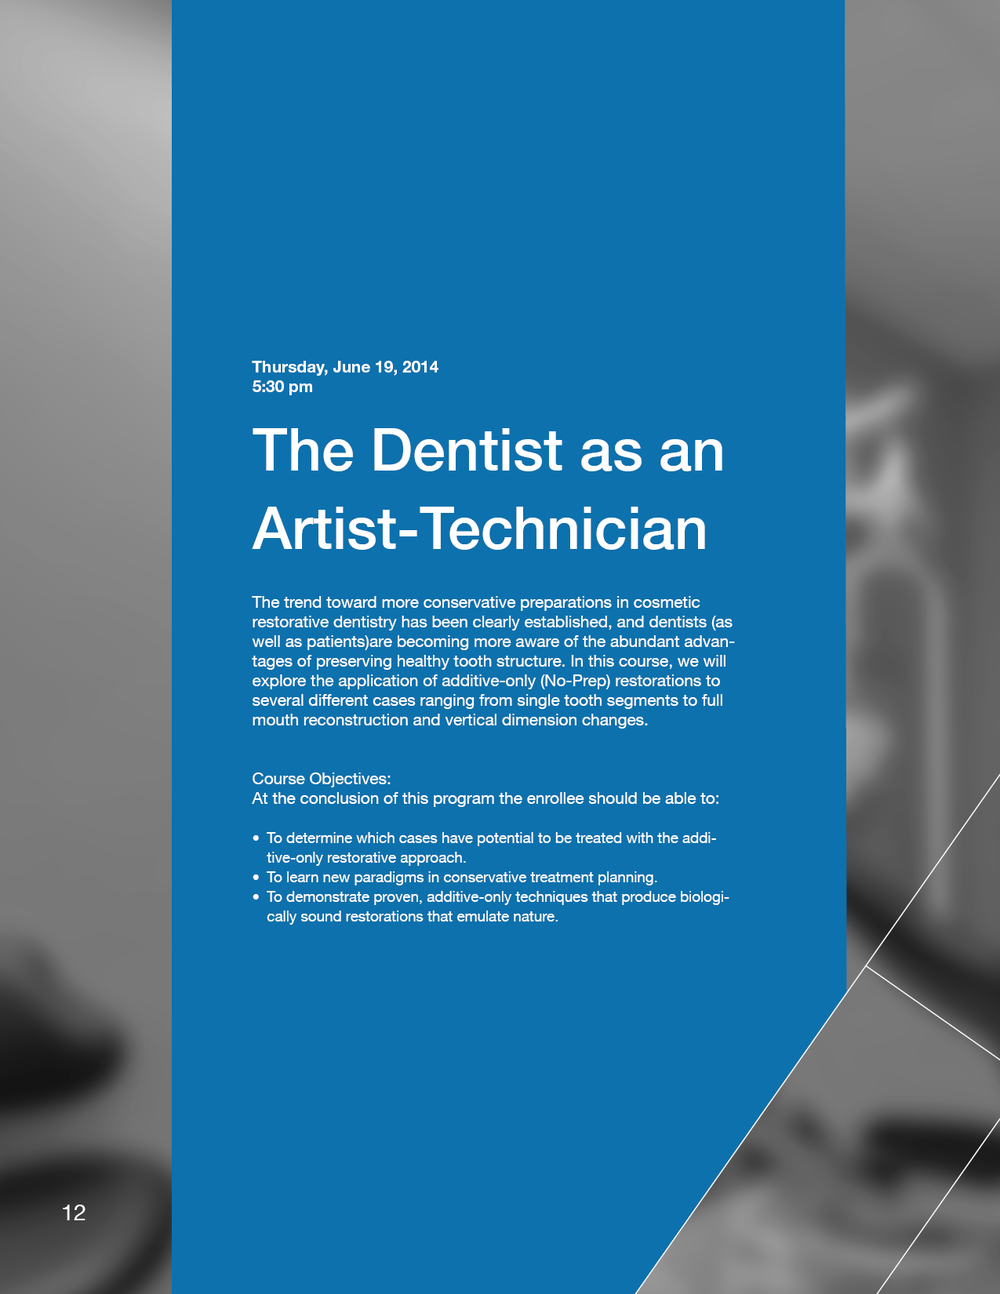 Dental Ed Brochure 2014_1_1512.png